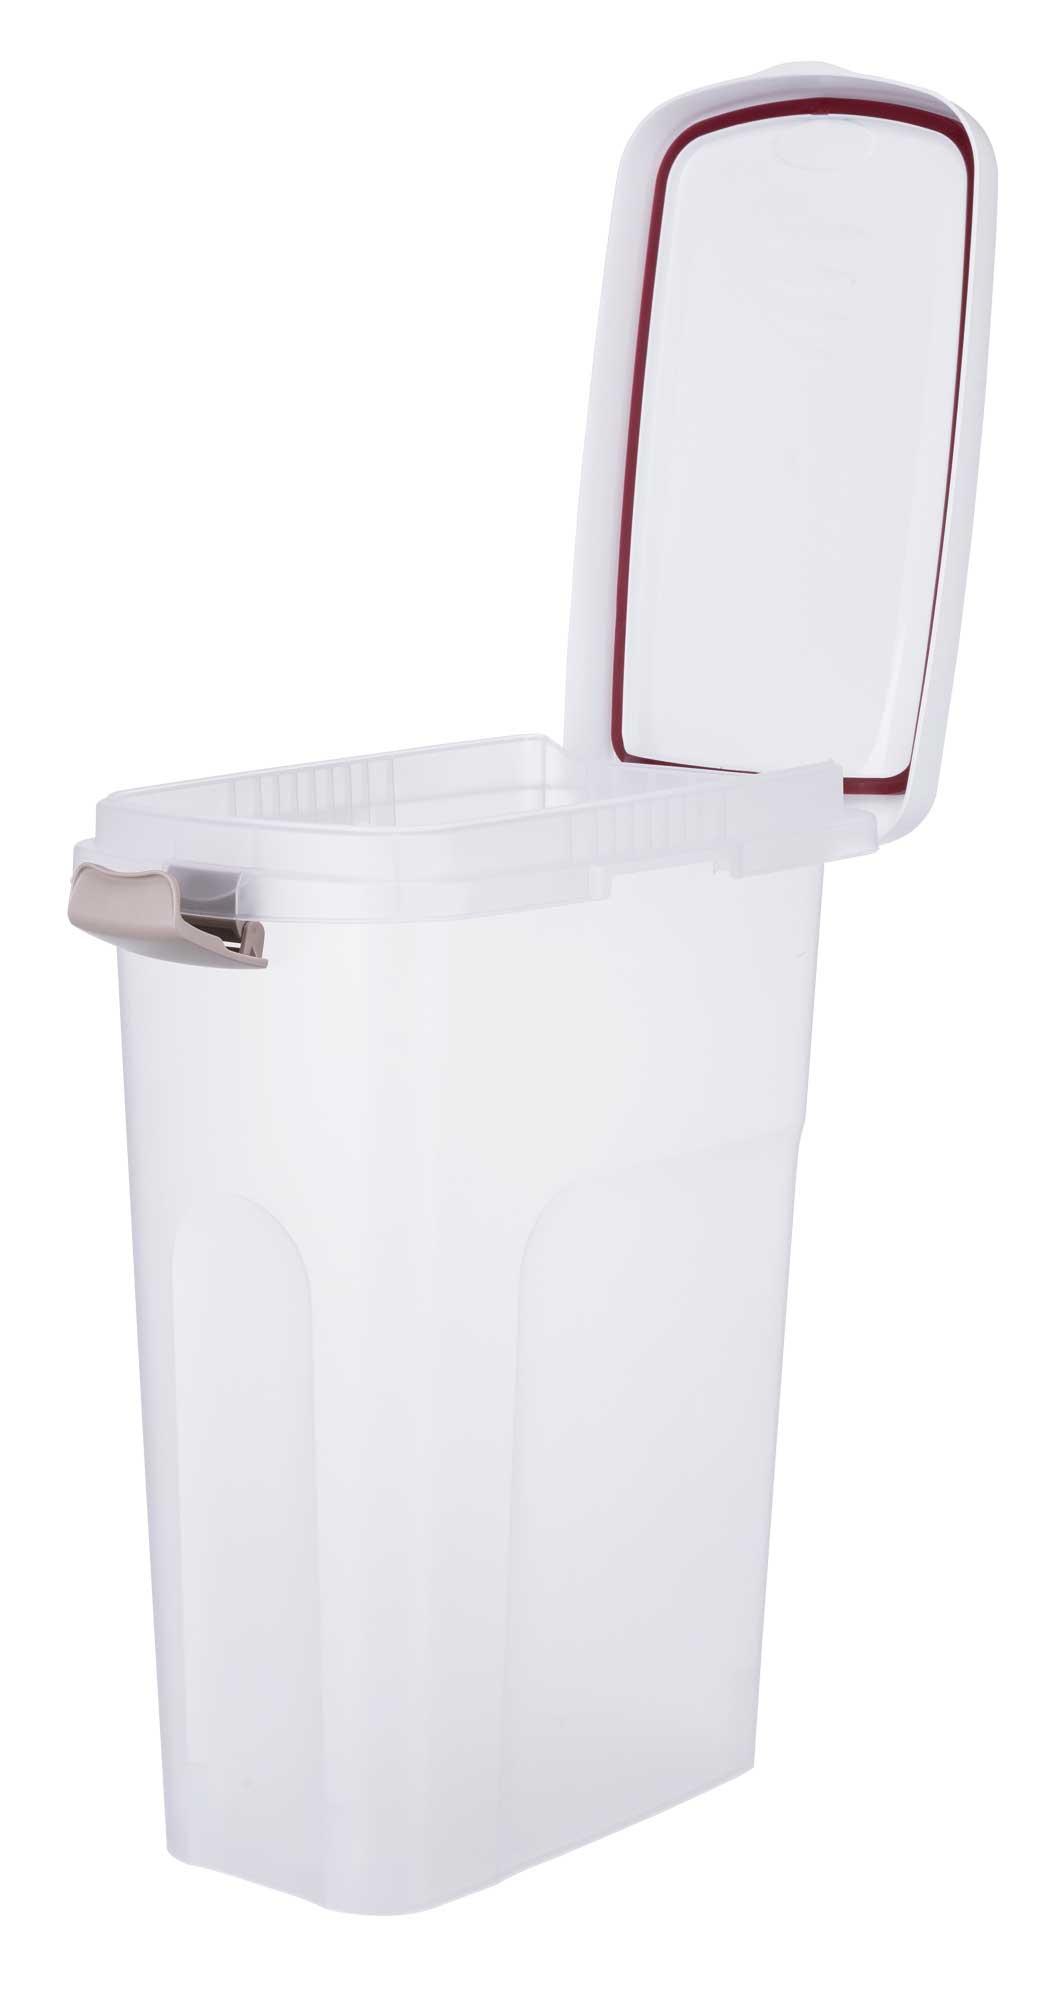 TRIXIE Futtertonne TRIXIE Tonne, luftdicht verschließbar, Kunststoff, 25 l/24 × 51 × 39 cm, transparent-we